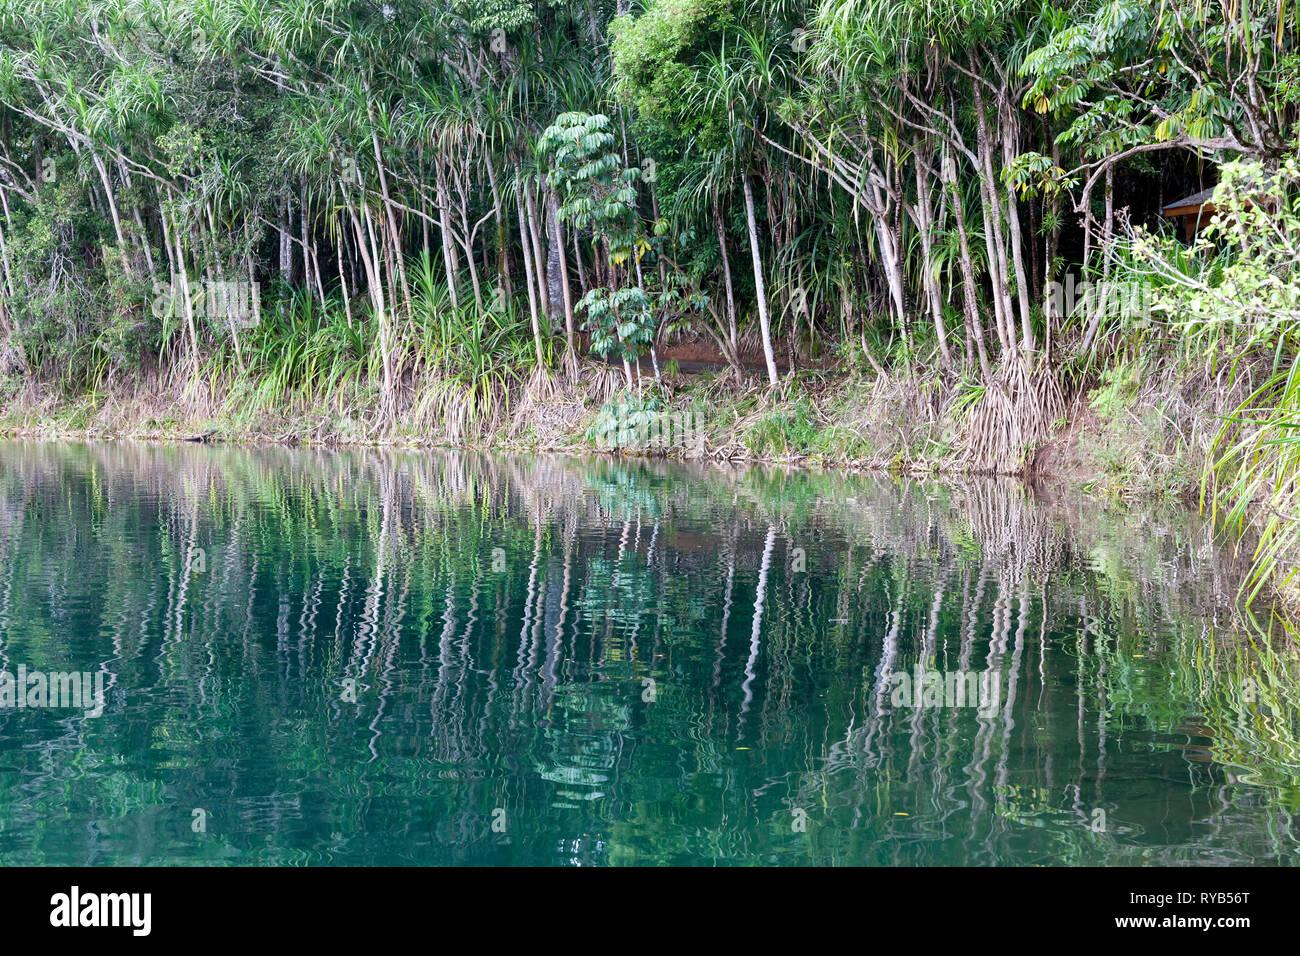 View of Lake Eacham, a popular lake of volcanic origin on the Atherton Tableland of Queensland, Australia, - Stock Image